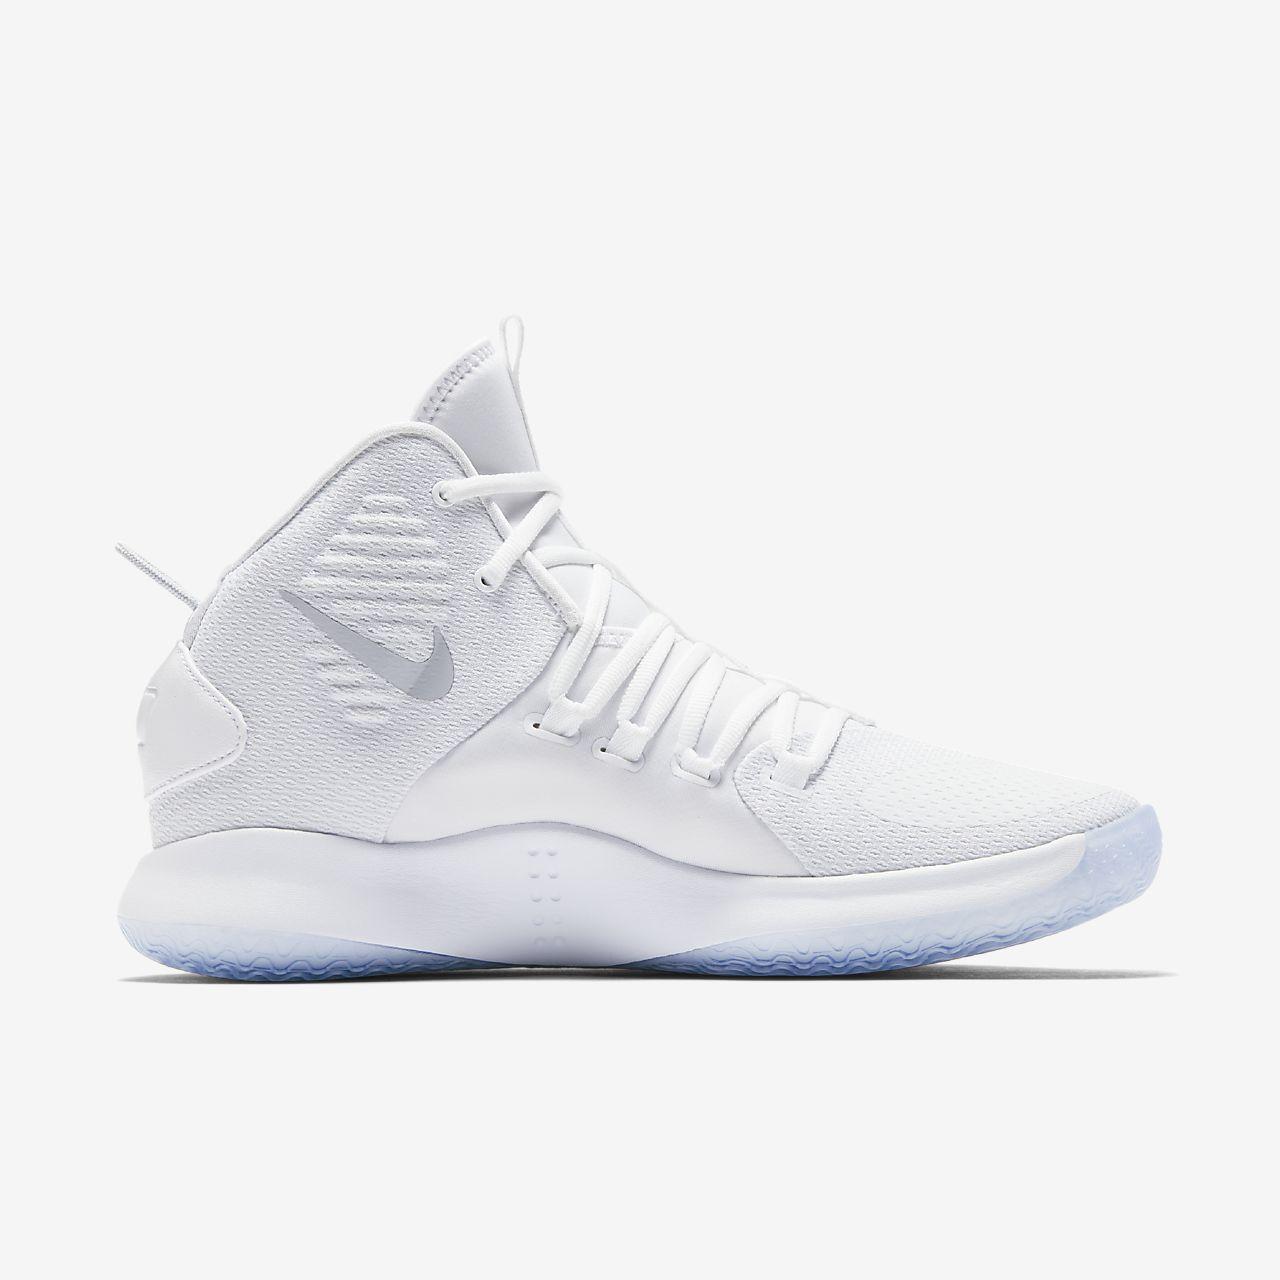 reputable site 8454d 14920 Basketball Shoe. Nike Hyperdunk X